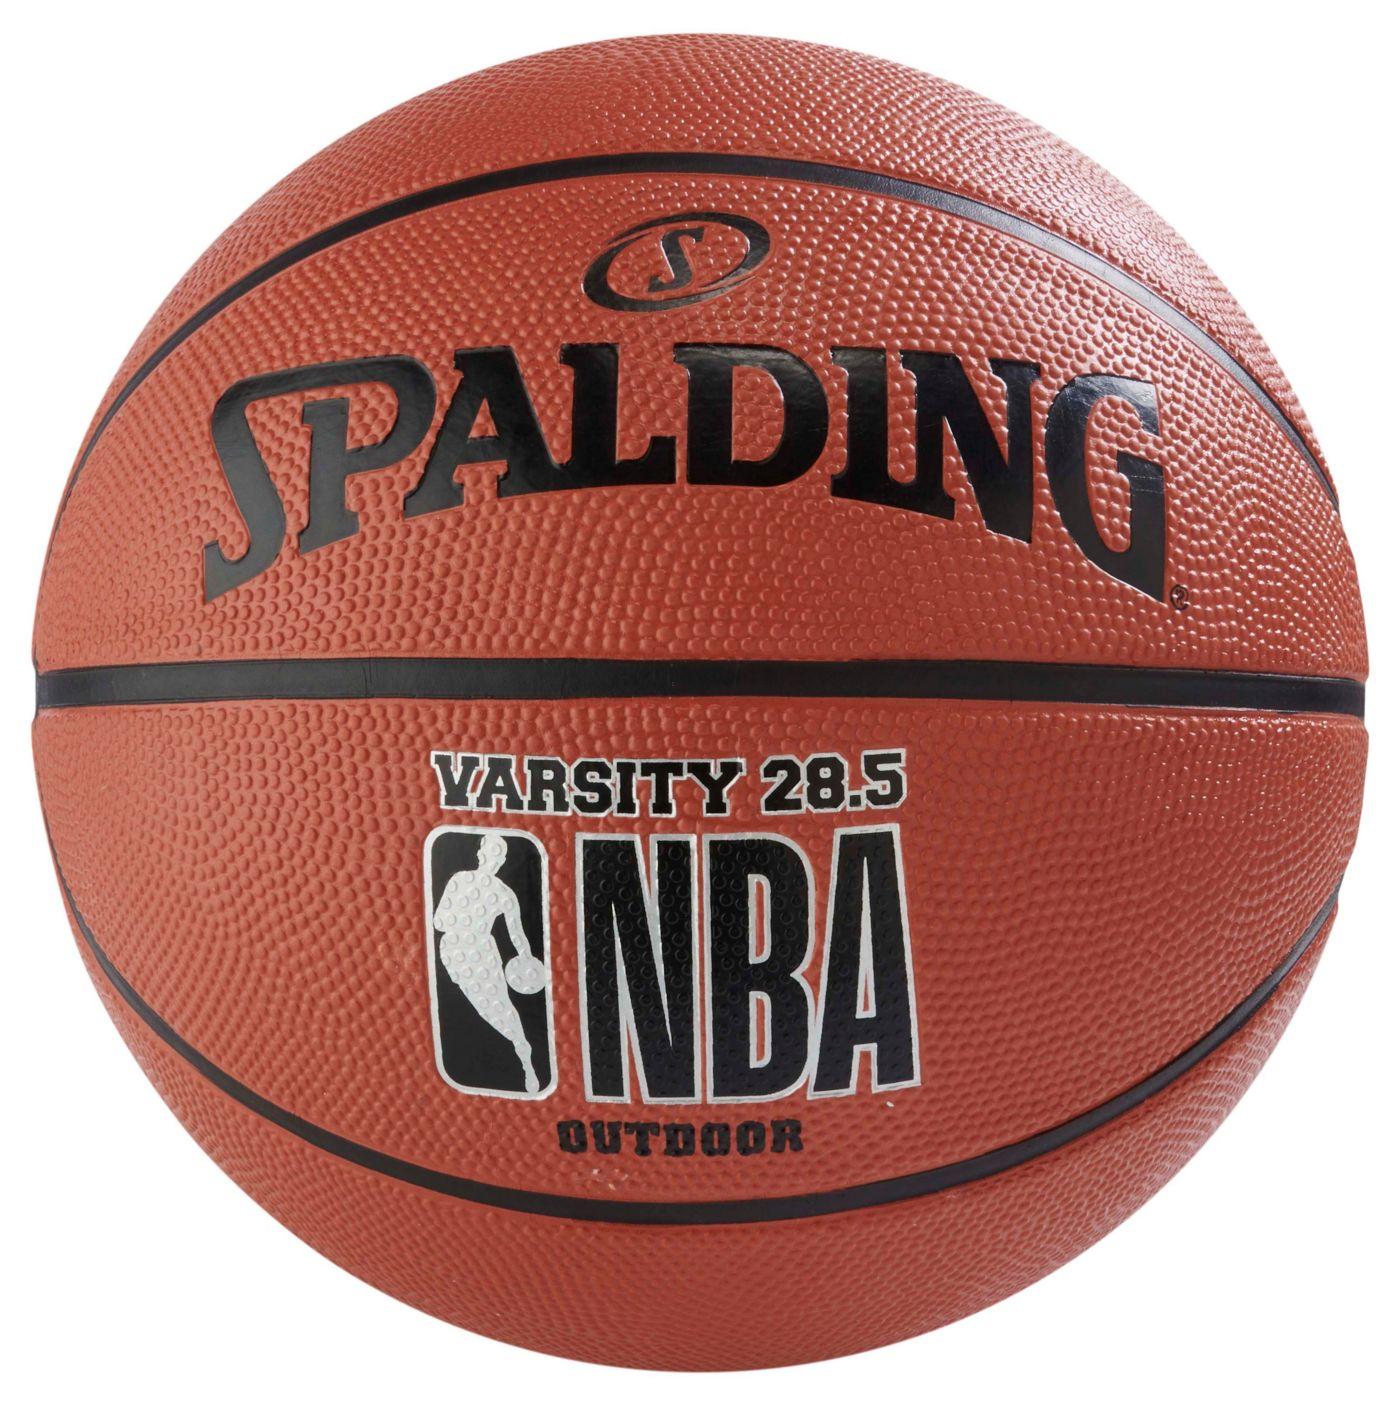 "Spalding NBA Varsity Outdoor Basketball (28.5"")"